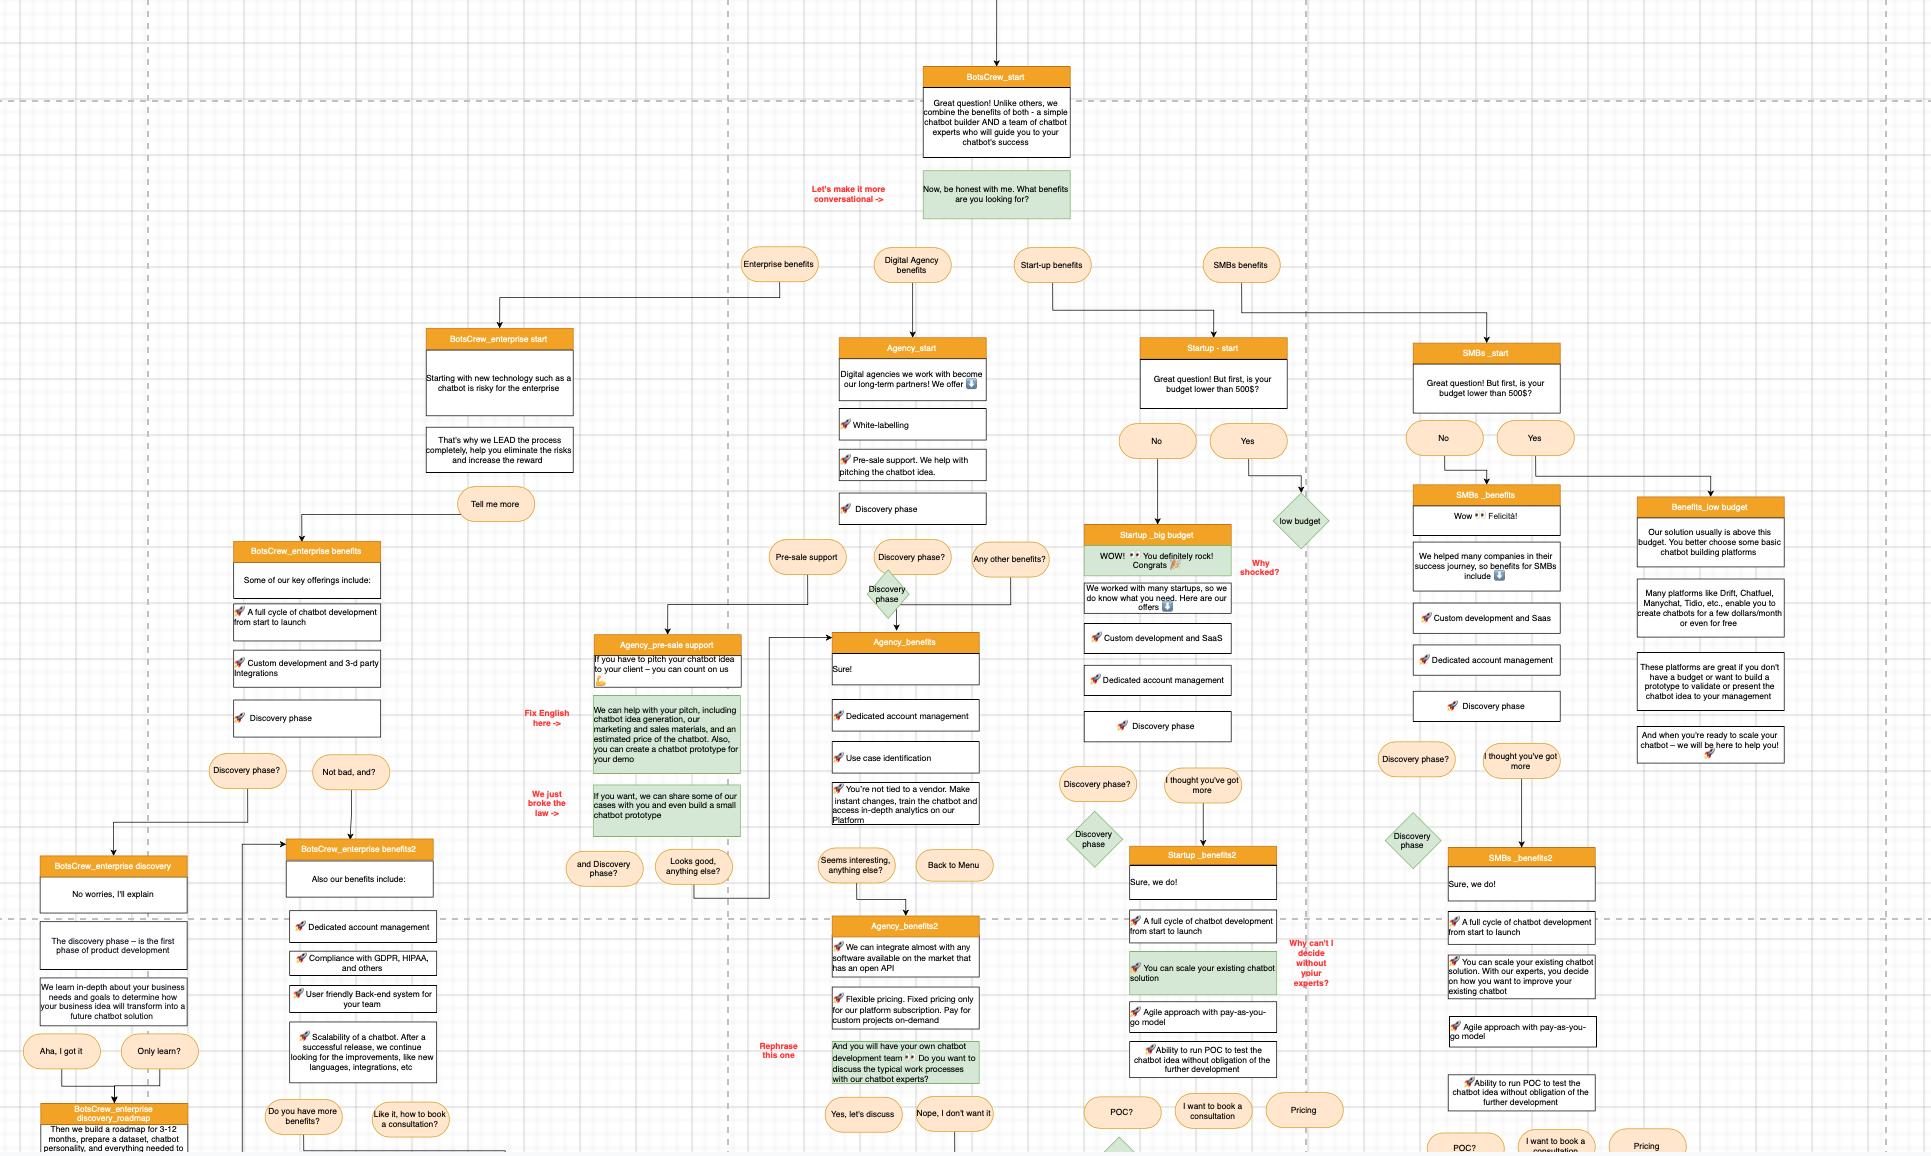 chatbot flow in dialogflow